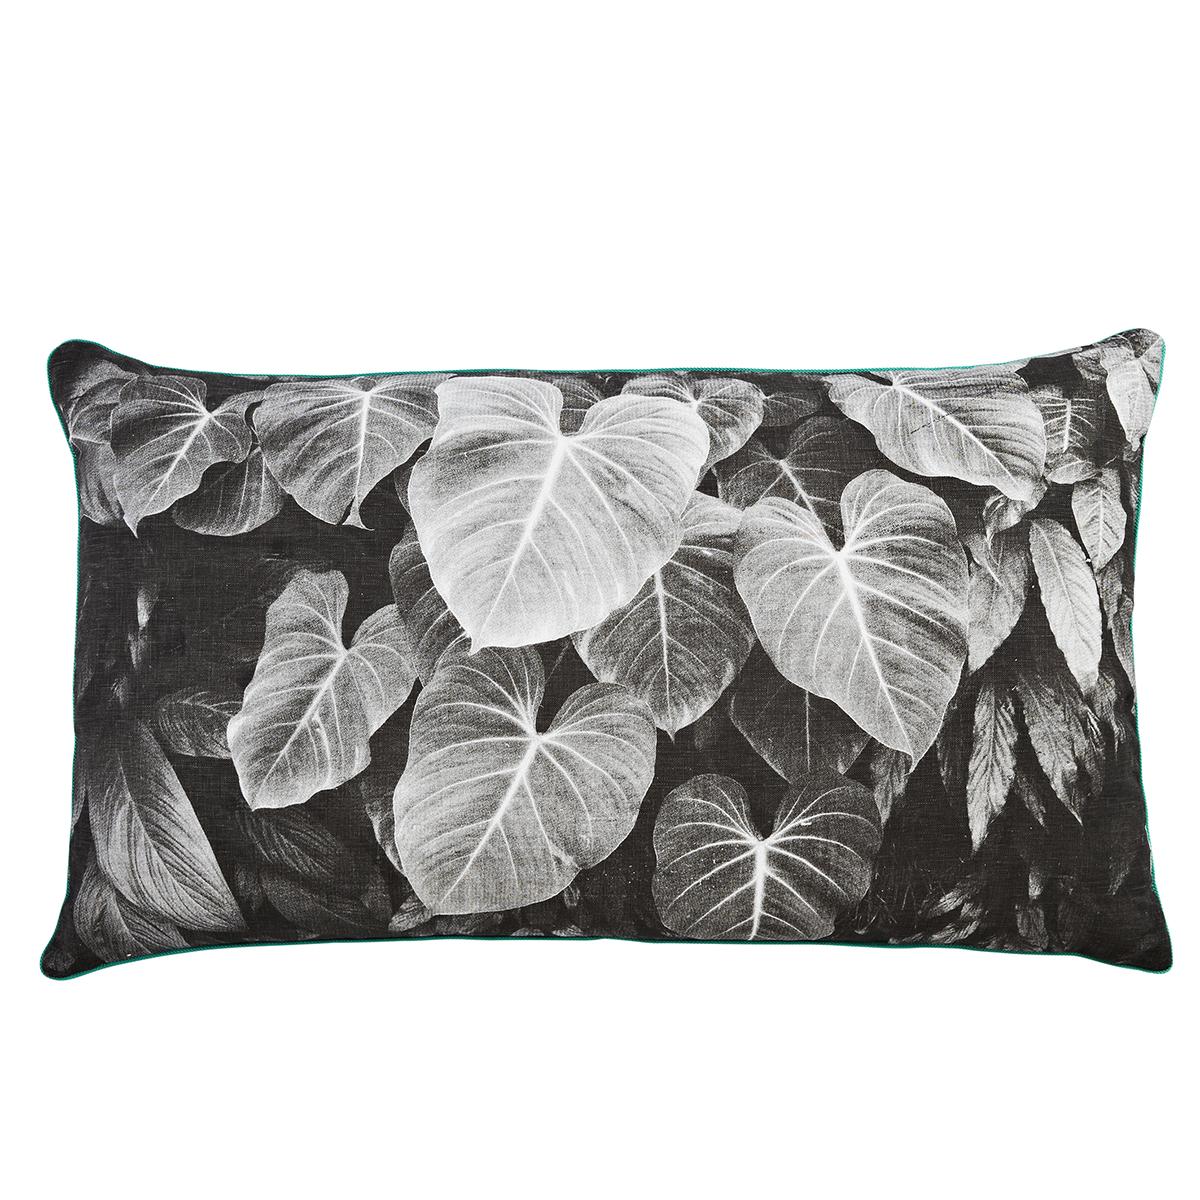 FC69-Jungle-Leaf-Black-75x45cm-low.jpg